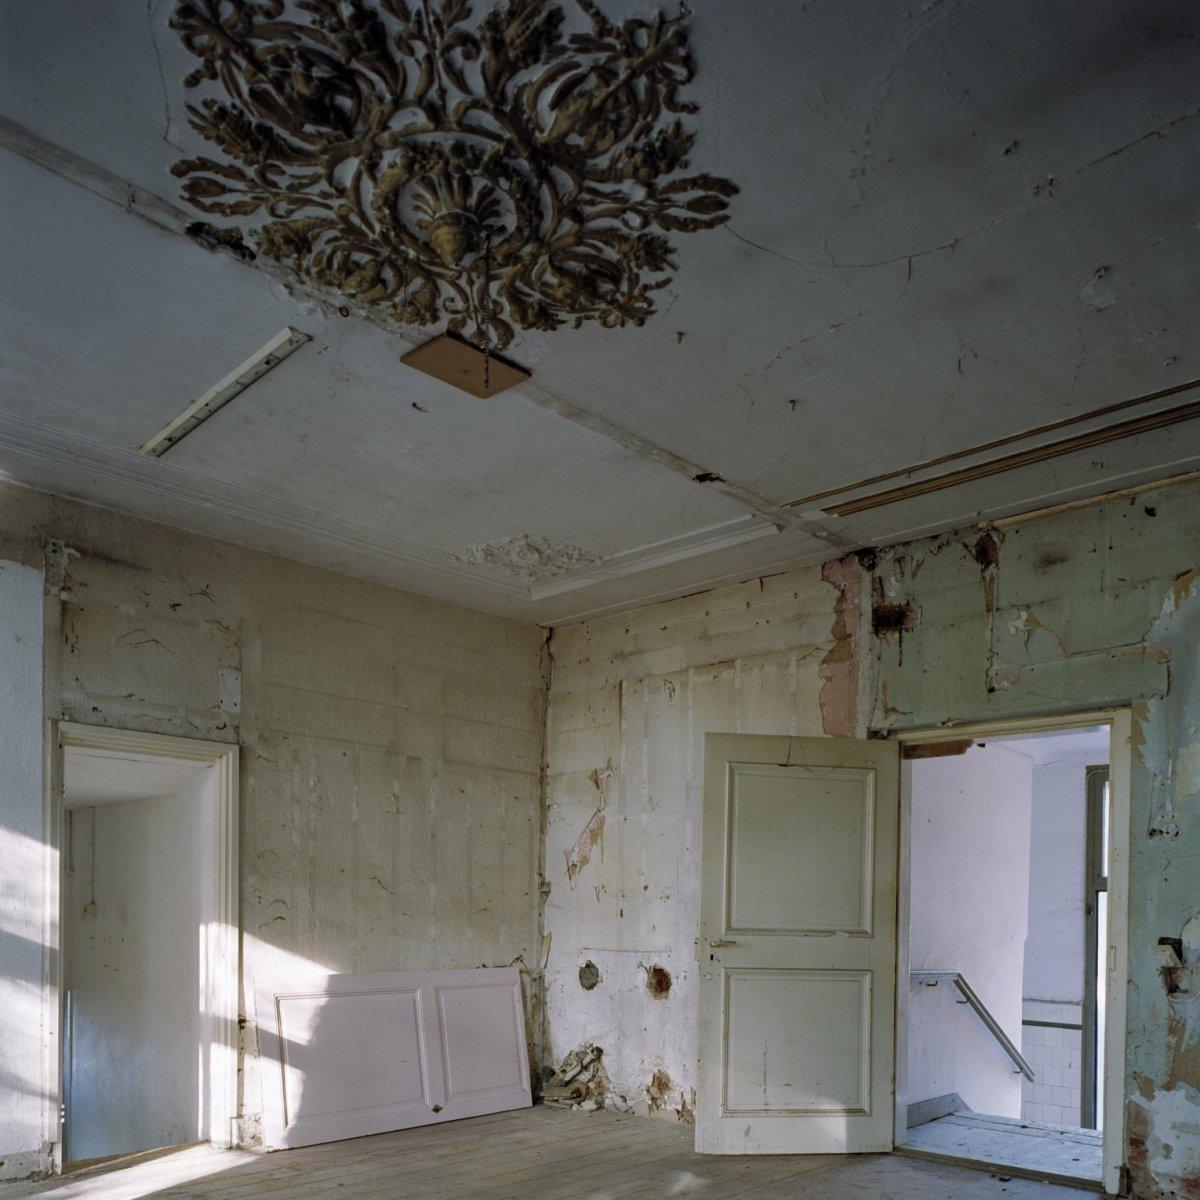 File:Slaapkamer met ornament aan het plafond - Beesel - 20379316 ...